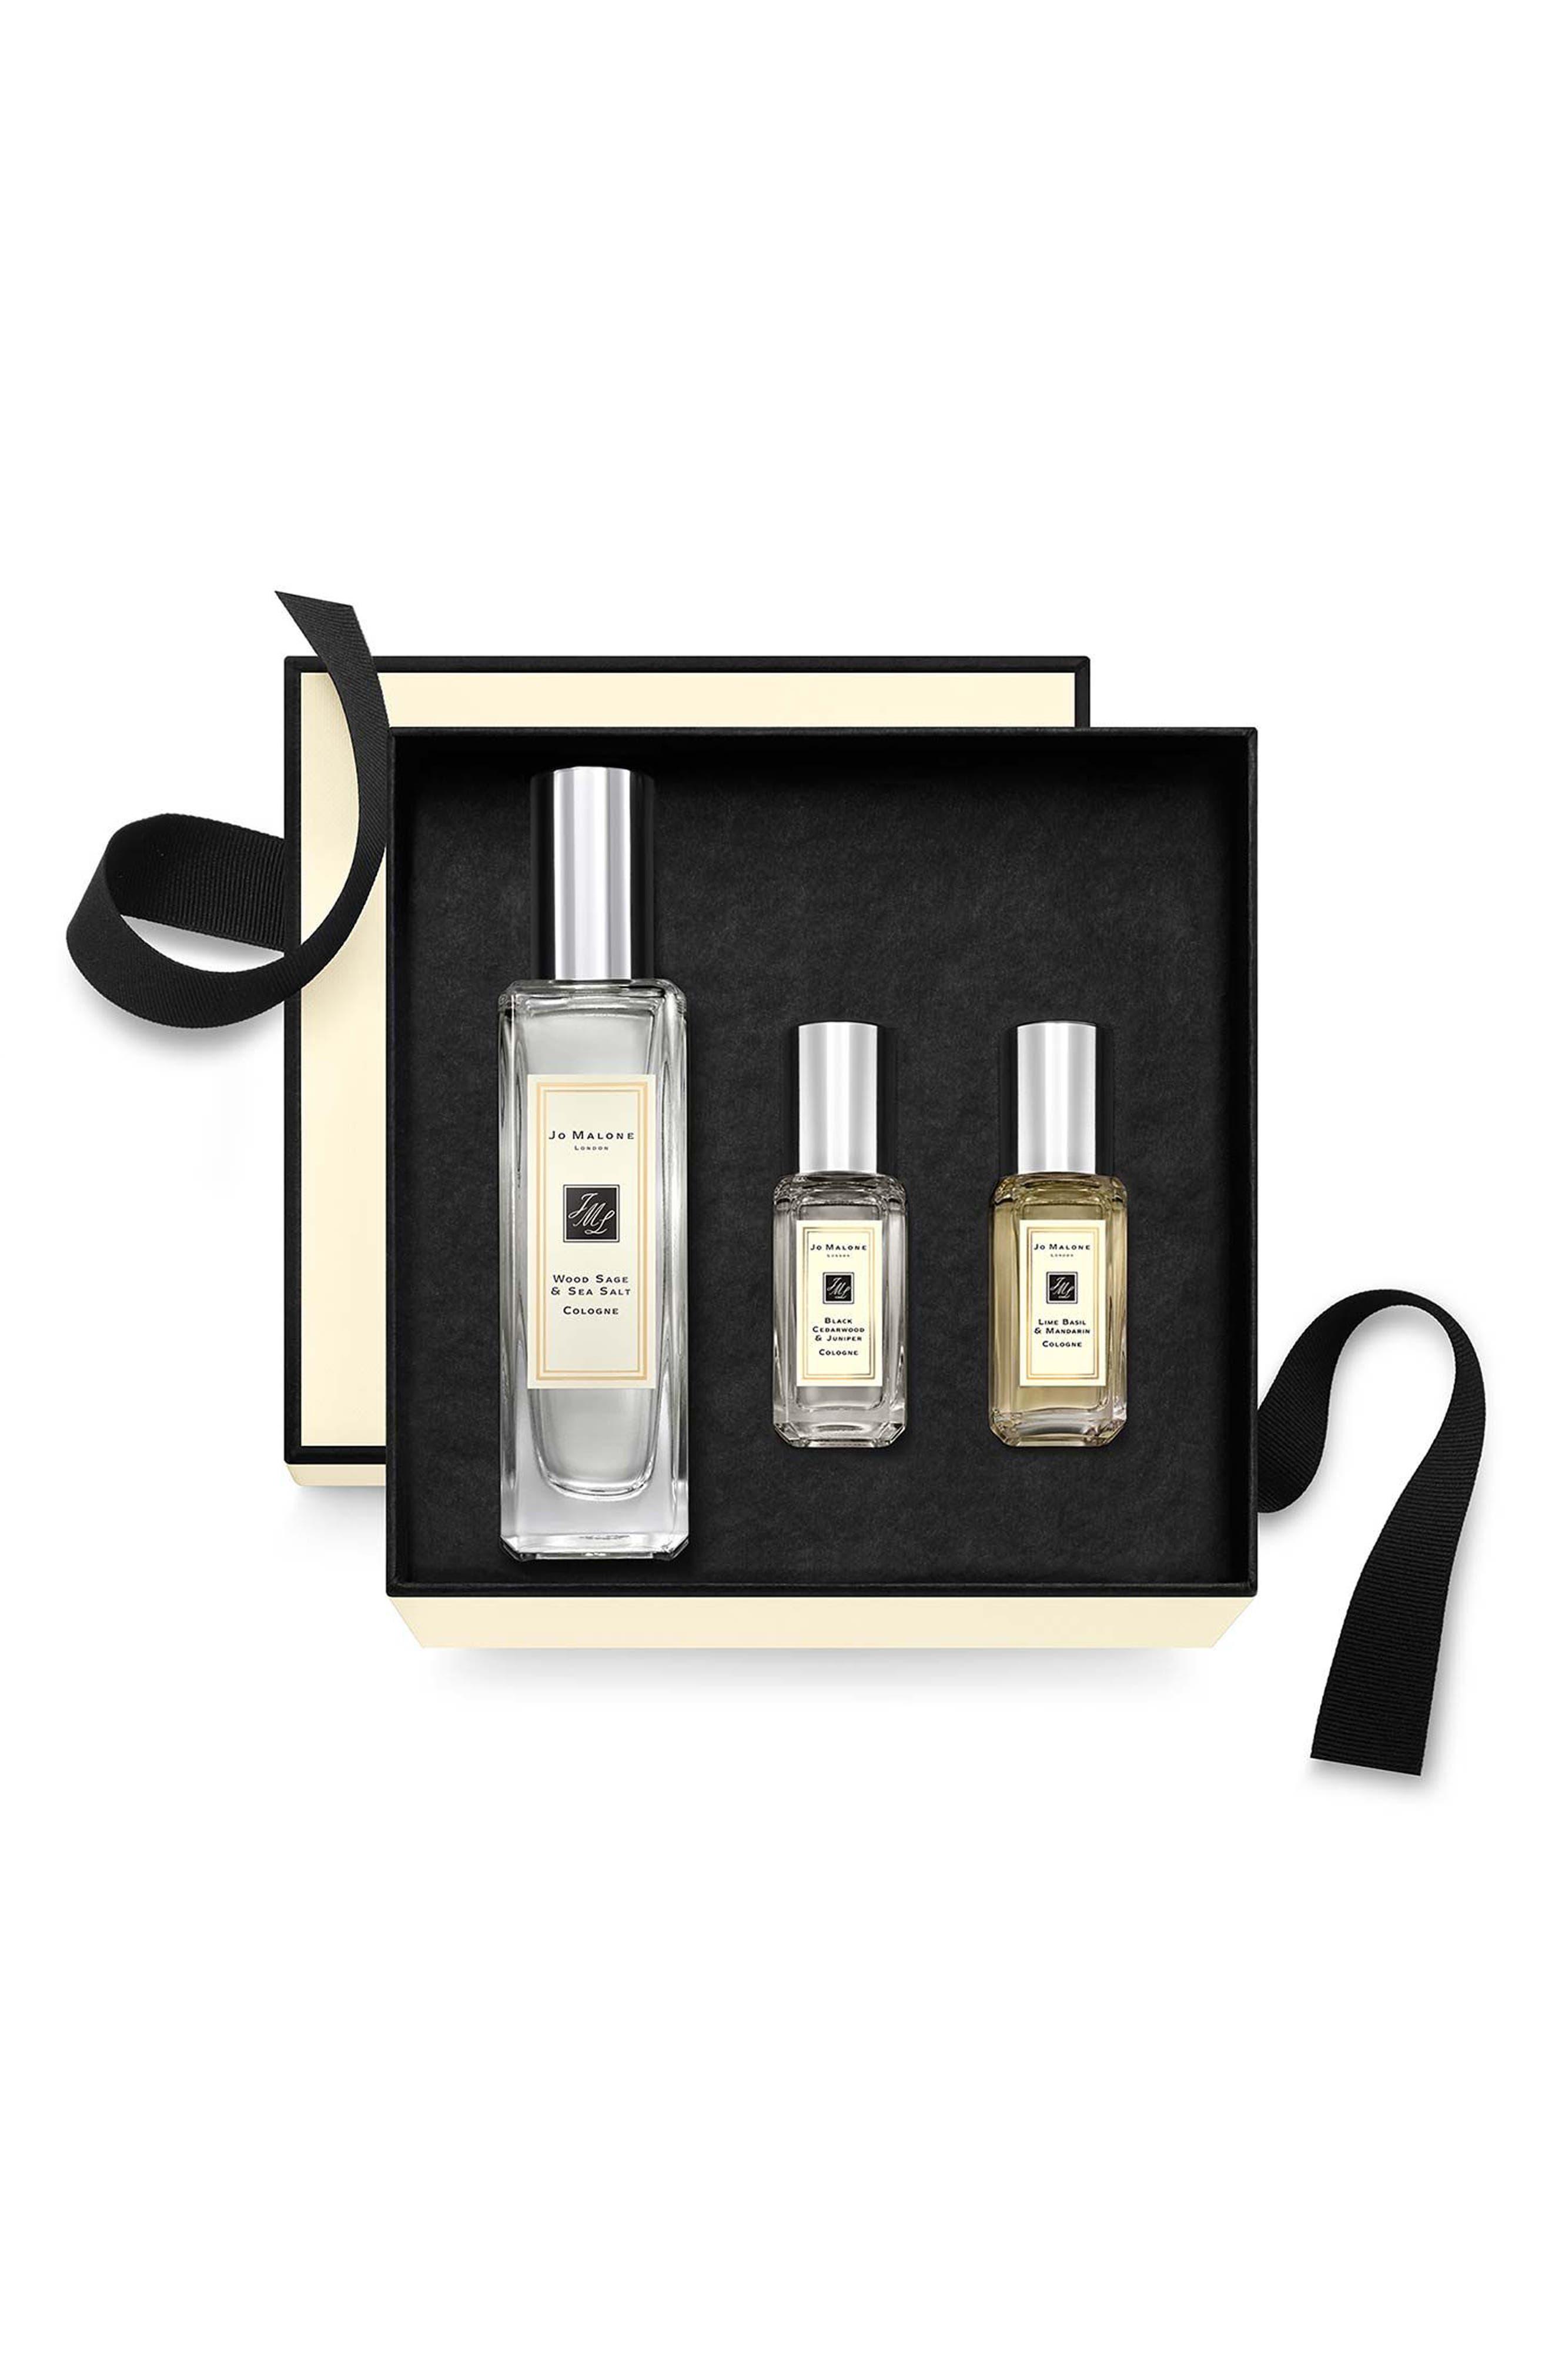 Main Image - Jo Malone London™ Wood Sage & Sea Salt Fragrance Combining™ Trio